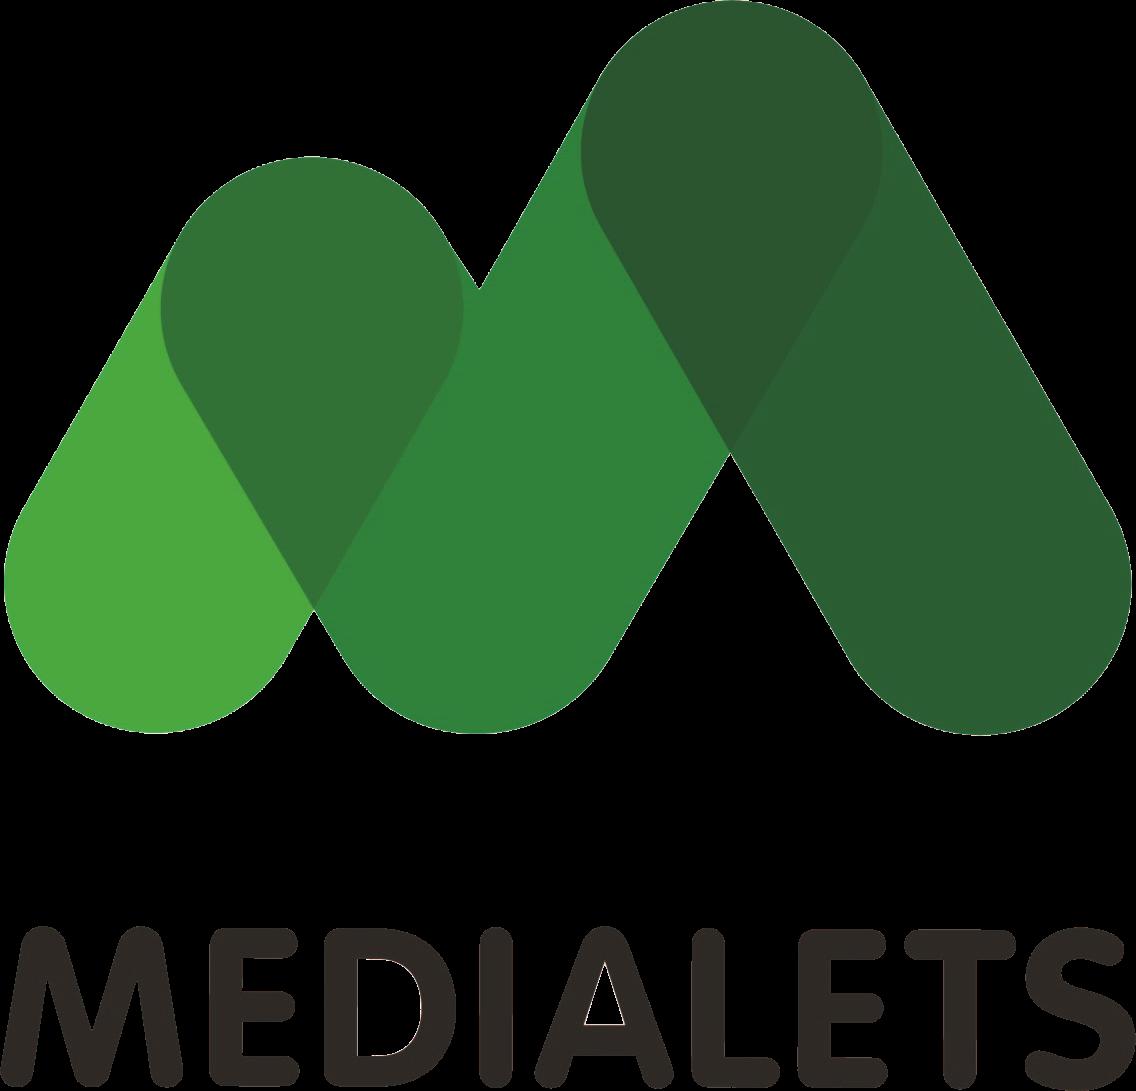 Medialets Customer Story